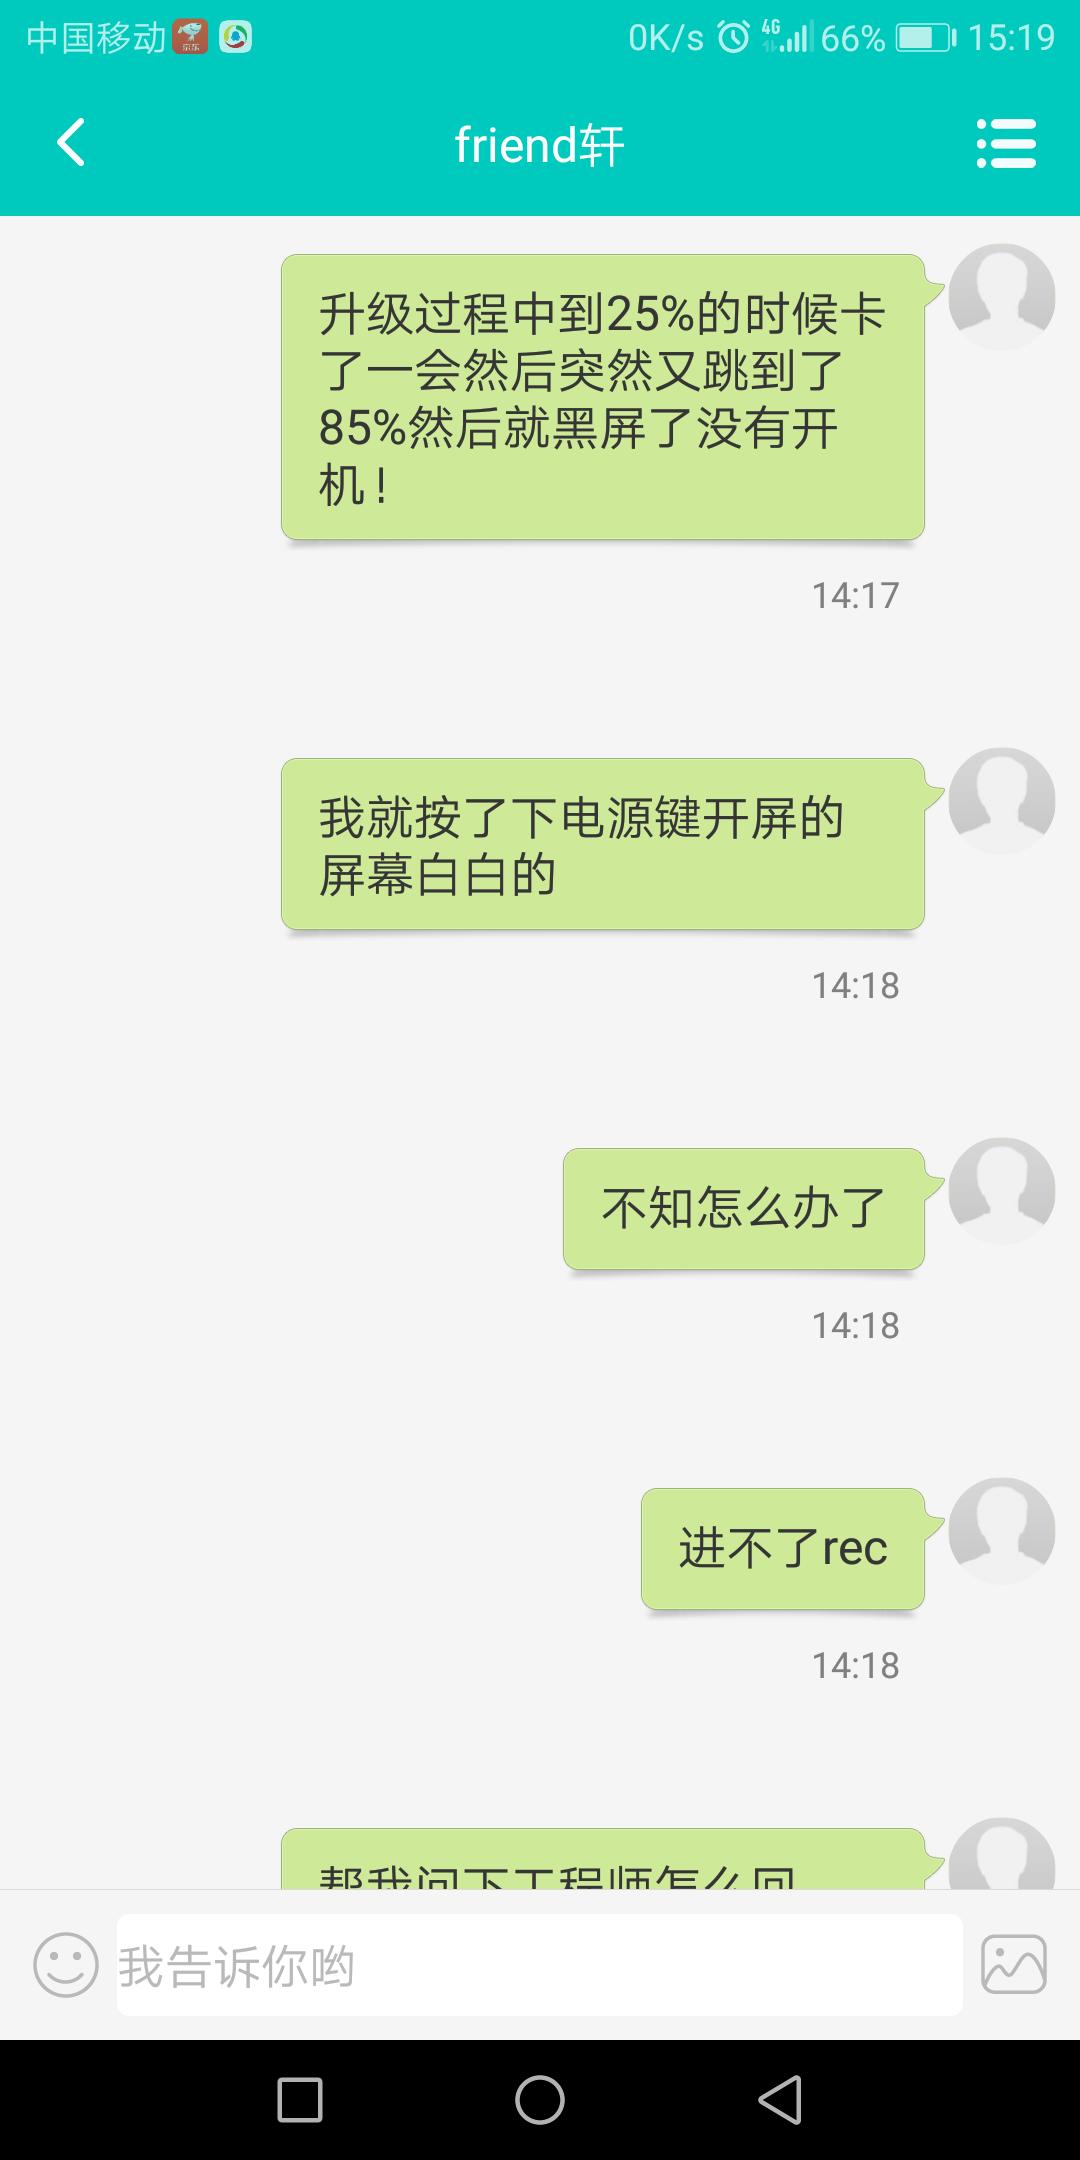 Screenshot_20181020-151940.png